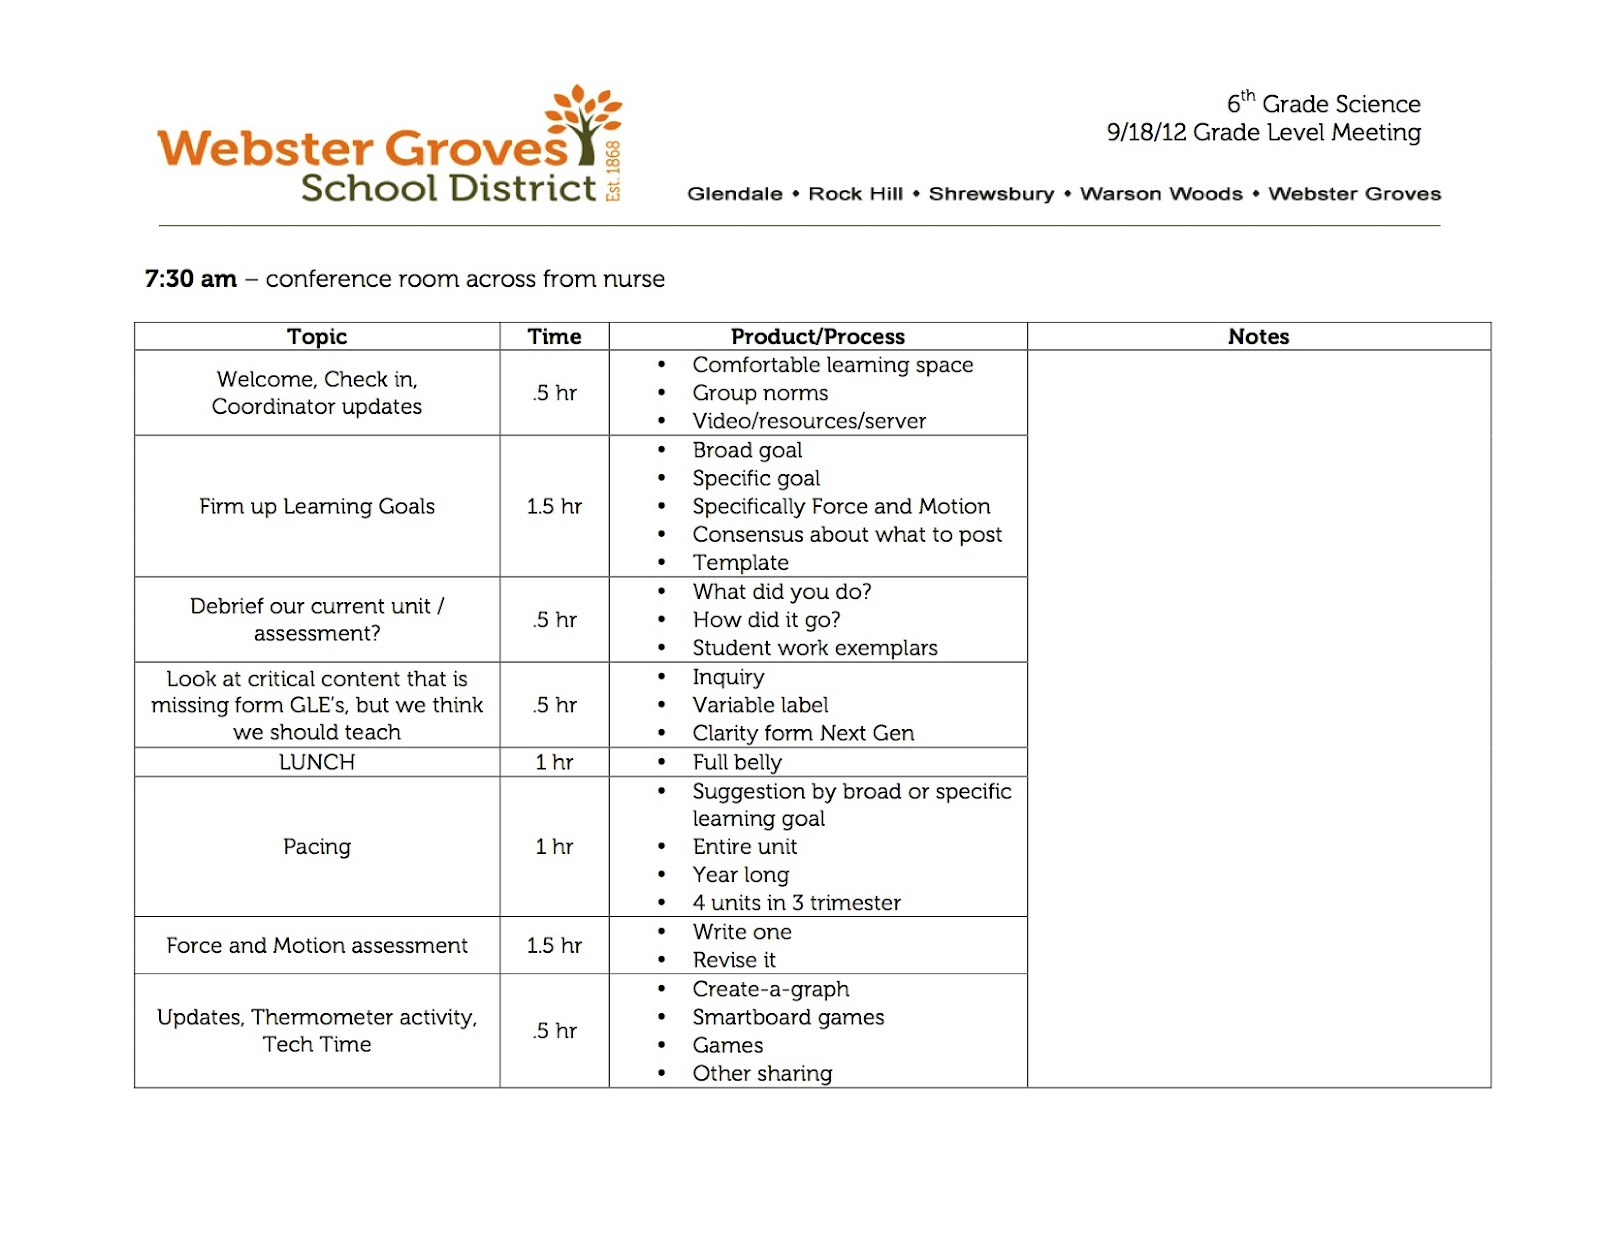 Meeting Planner Templates Medical Practice Administrator Sample 6th%2Bgrade Meeting  Planner Templateshtml  Meeting Planner Templates